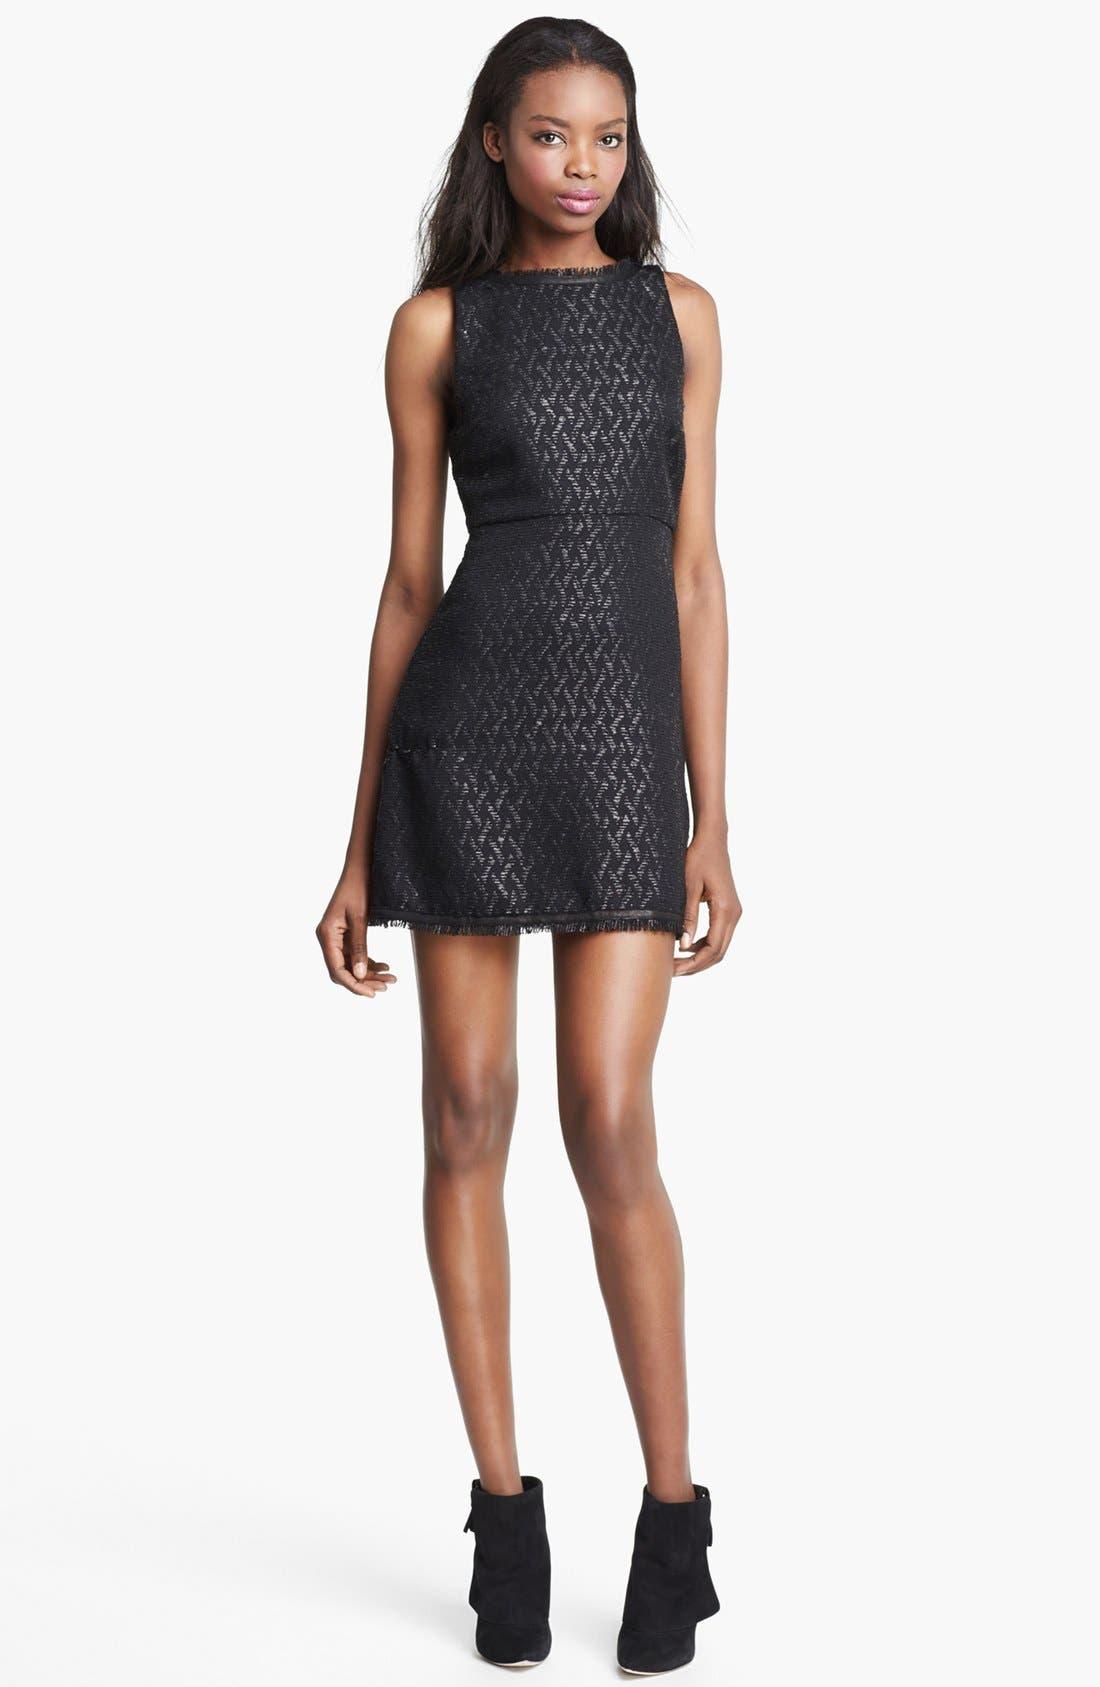 Main Image - Alice + Olivia 'Sardo' Leather Detail Dress